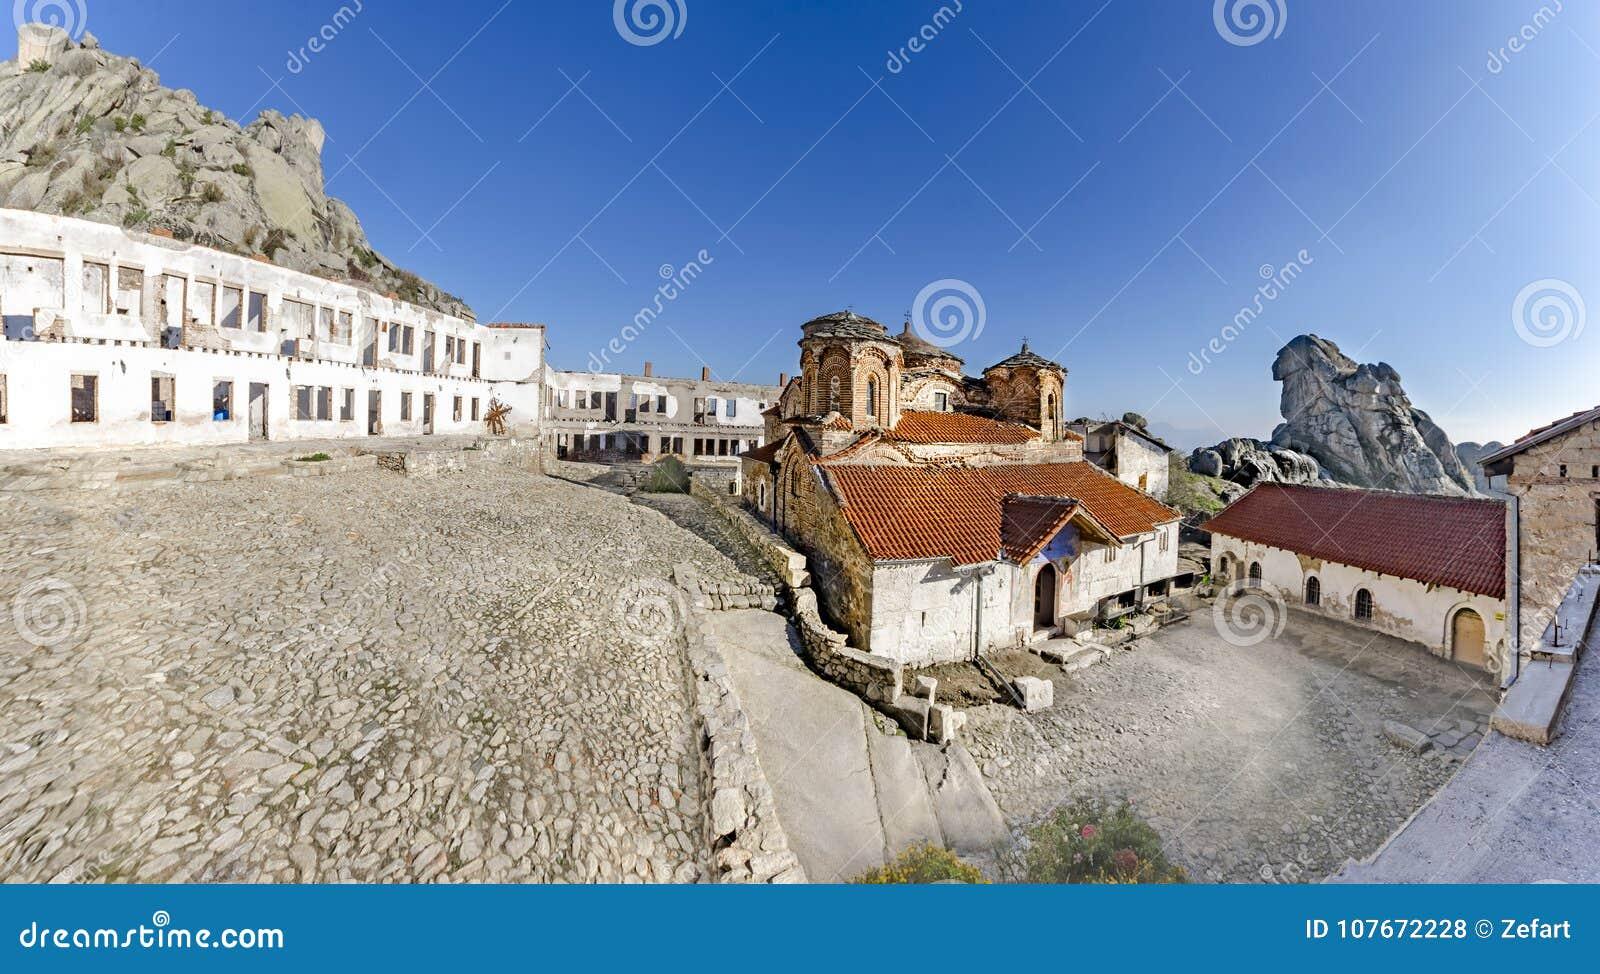 Panoramic view of Treskavec Monastery in Prilep, Macedonia